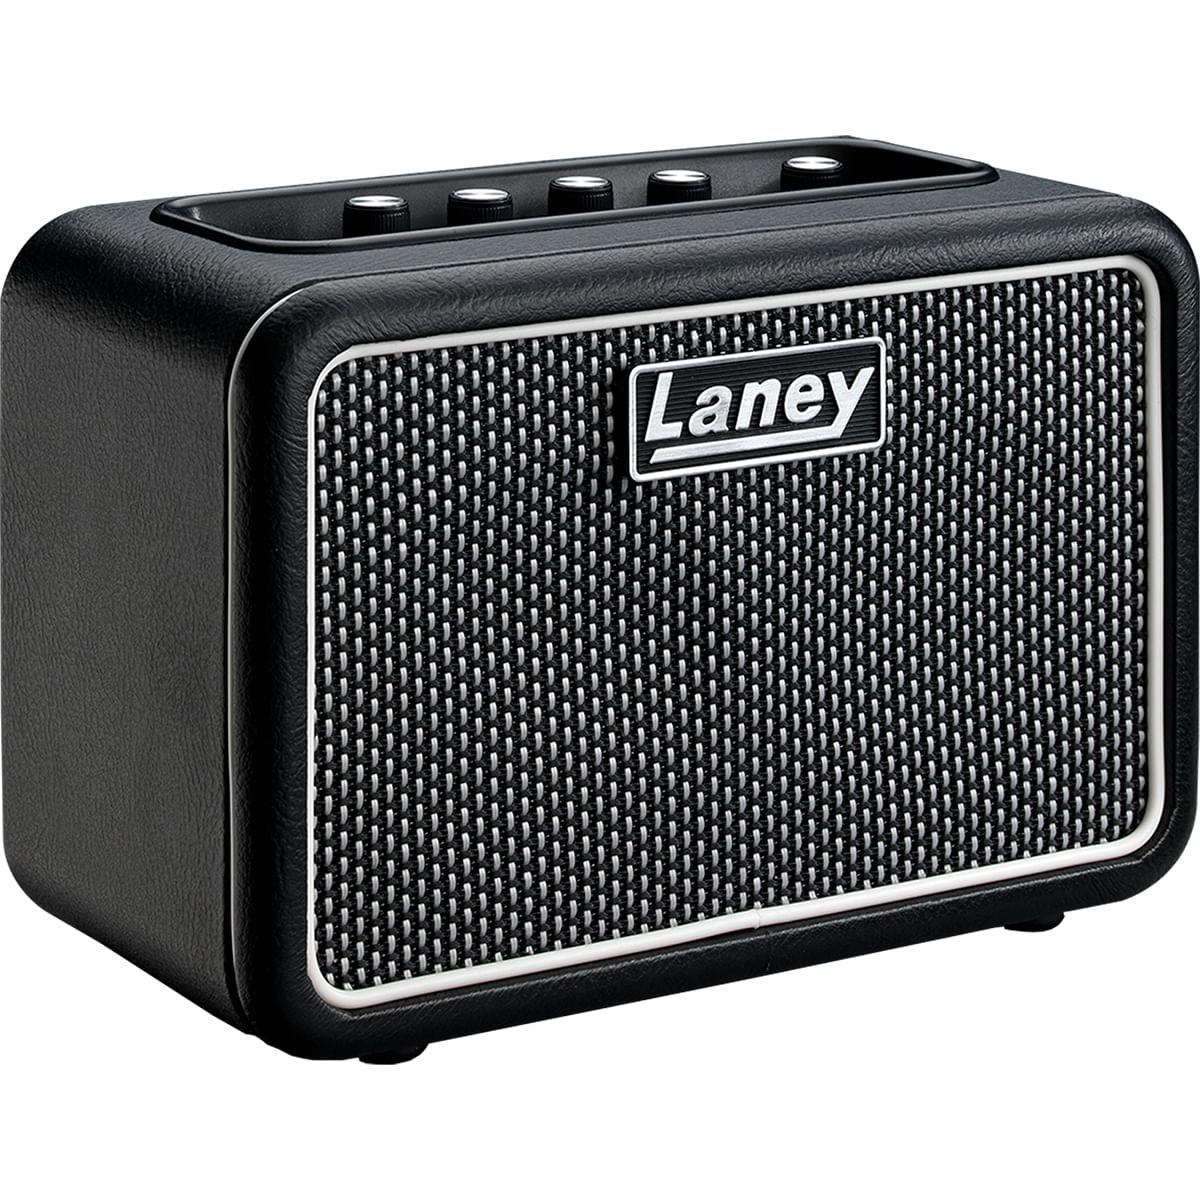 amplificador-de-guitarra-com-bluetooth-mini-stb-superg-laney-3